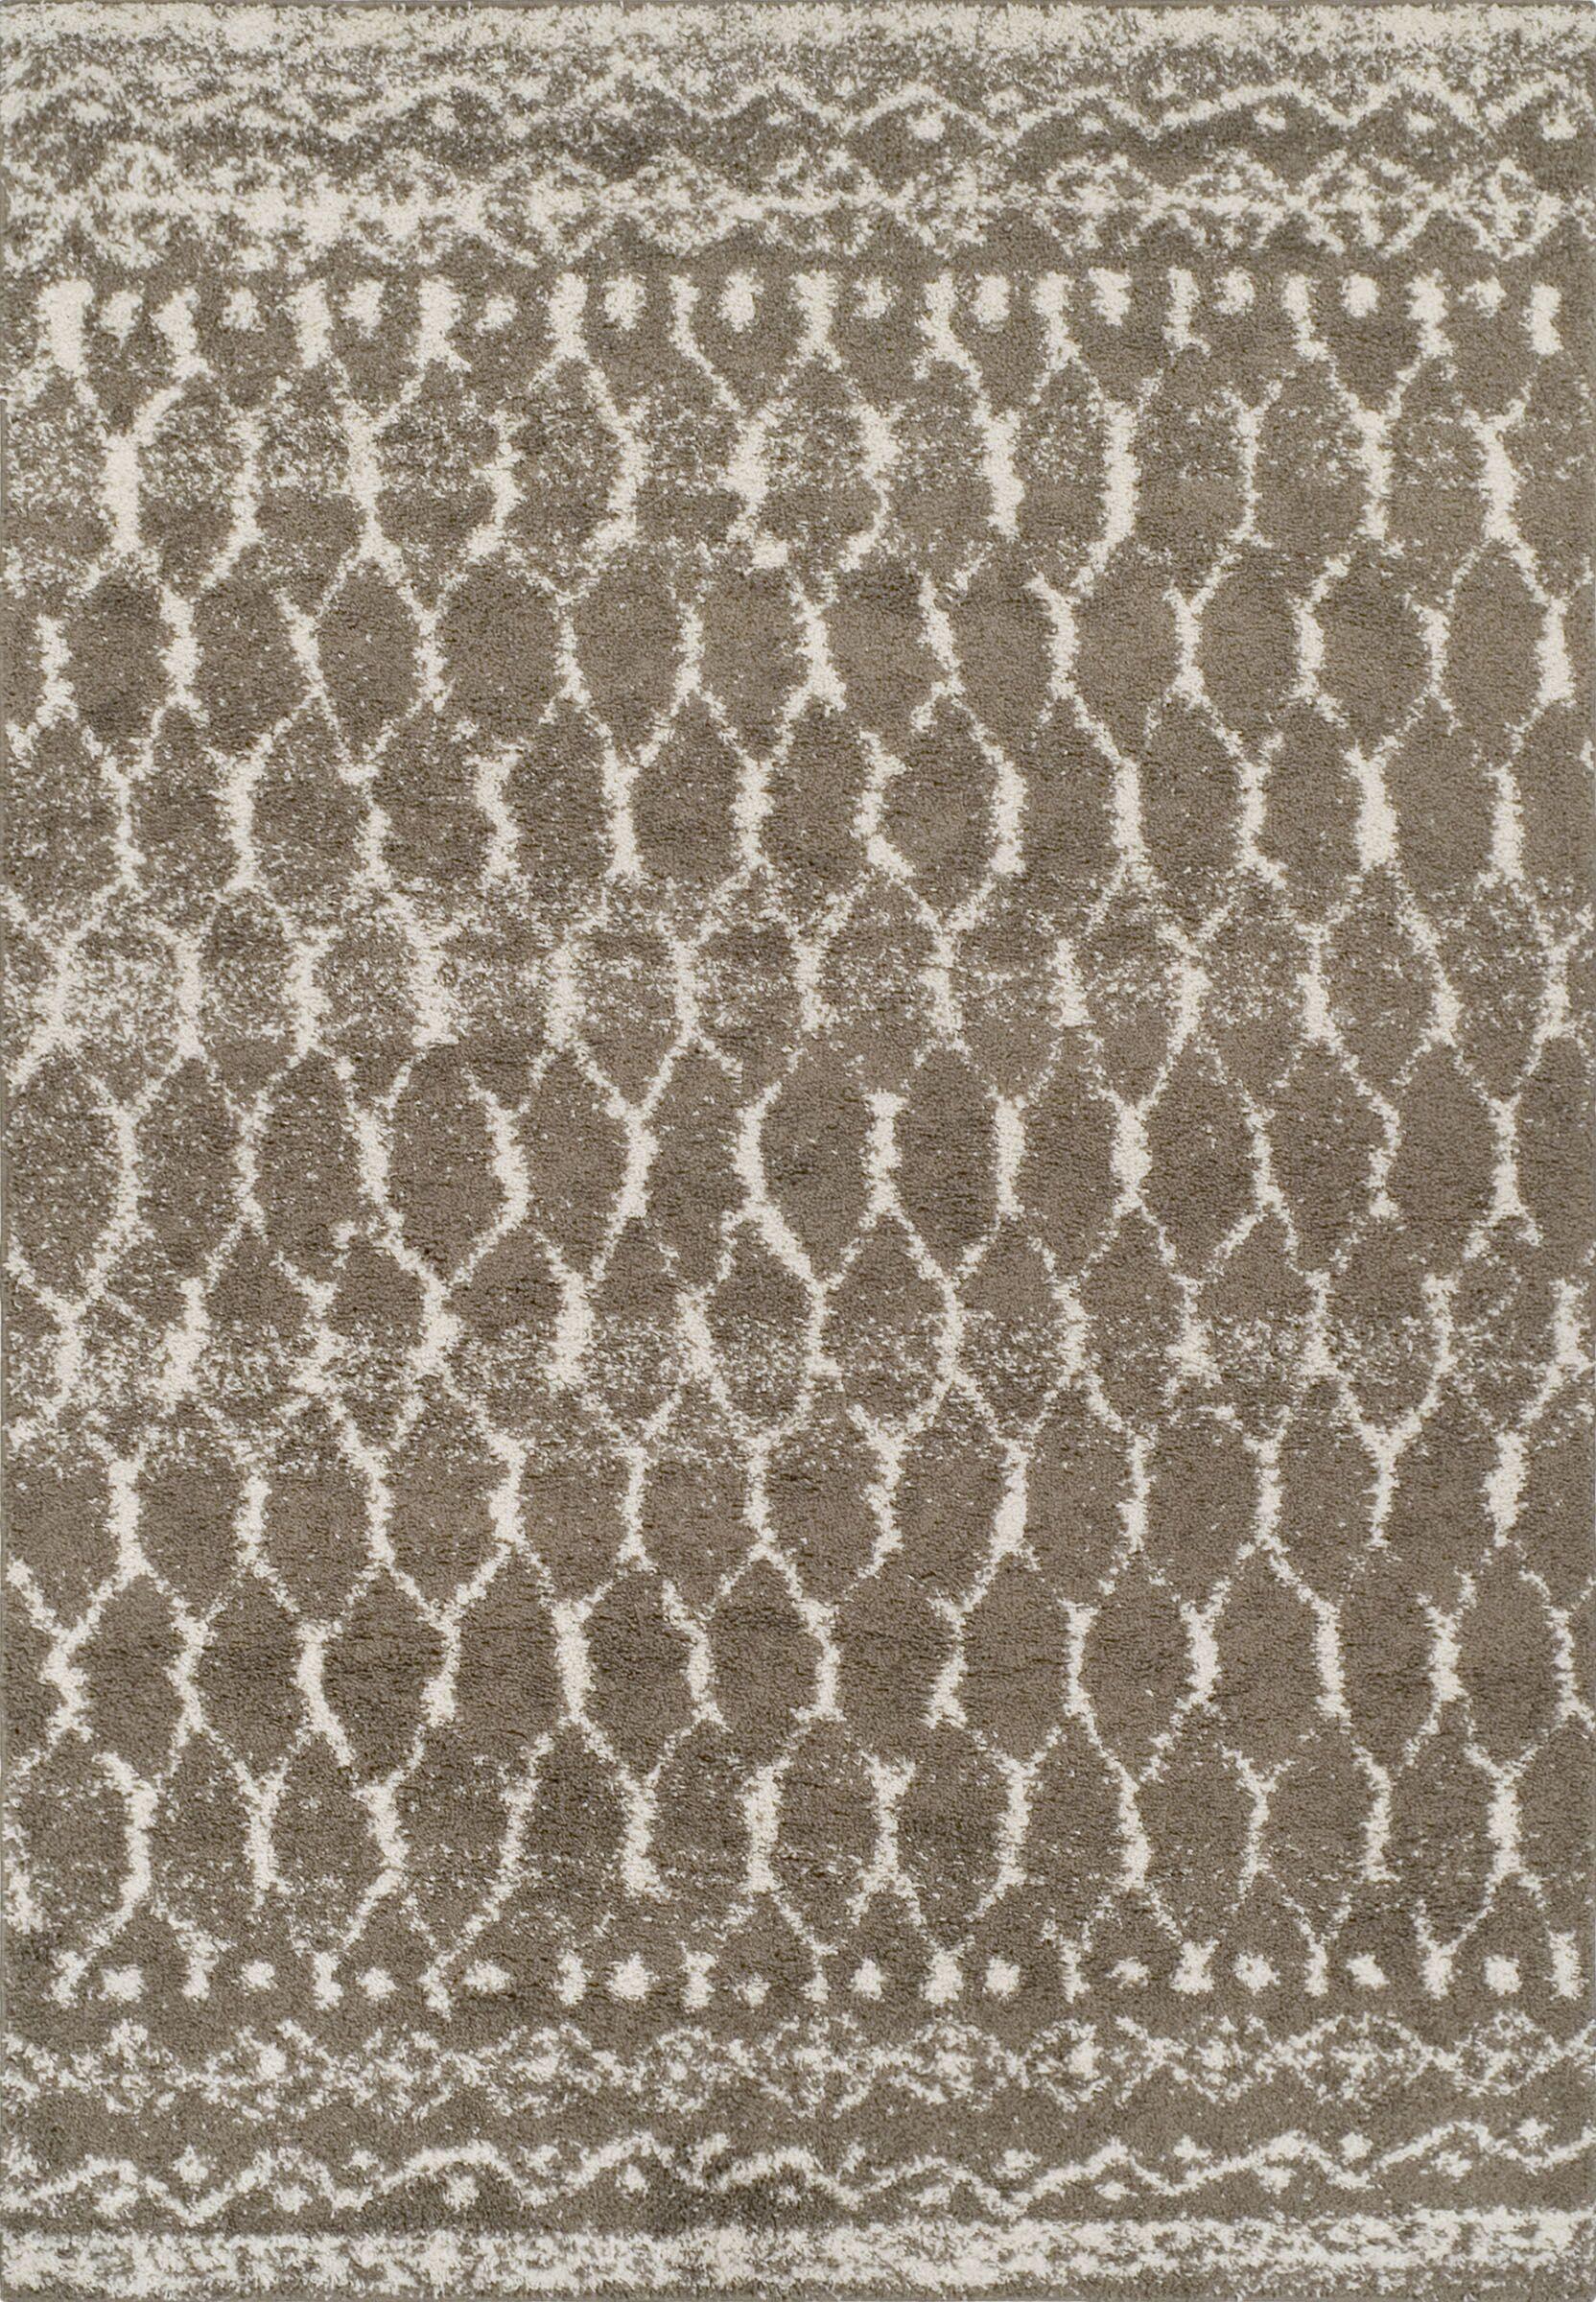 Thio Shag Taupe/Ivory Area Rug Rug Size: Rectangle 5'1